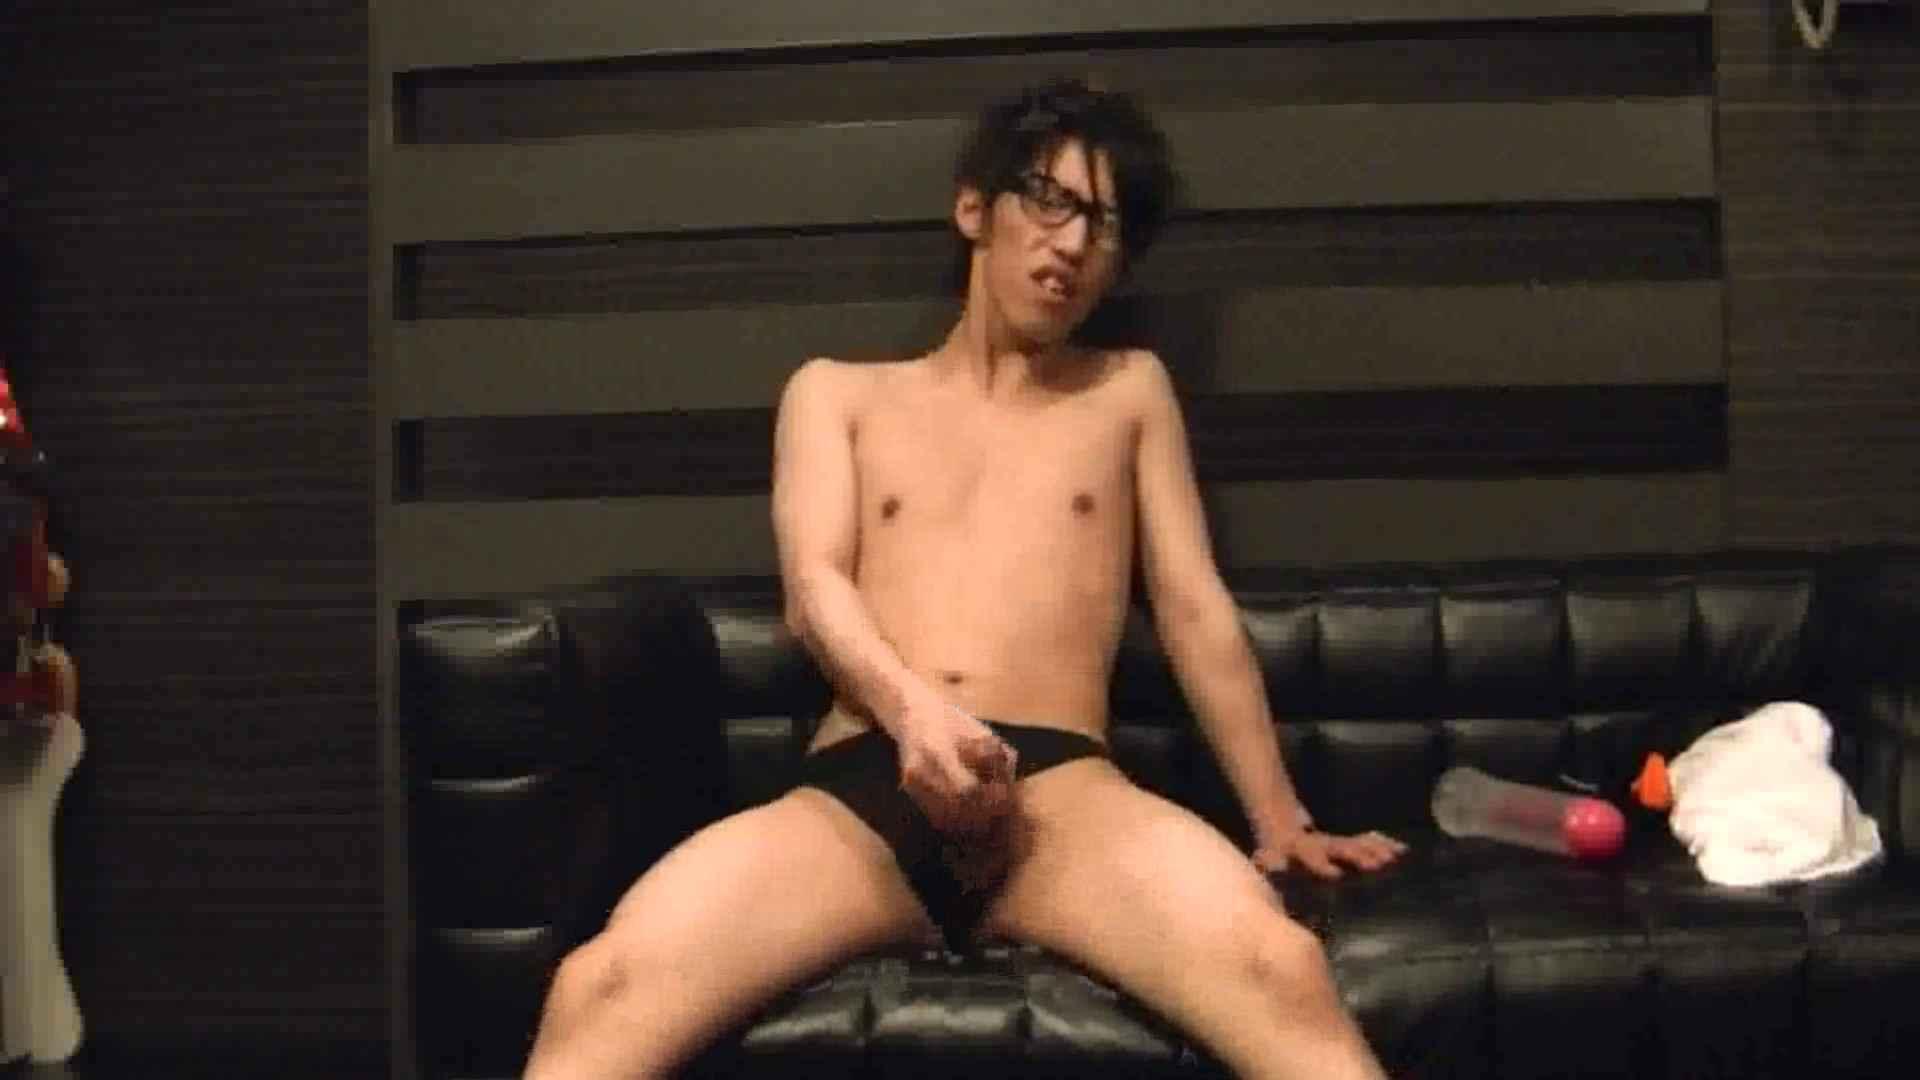 ONA見せカーニバル!! Vol3 モザ無し ゲイ無修正画像 87枚 15